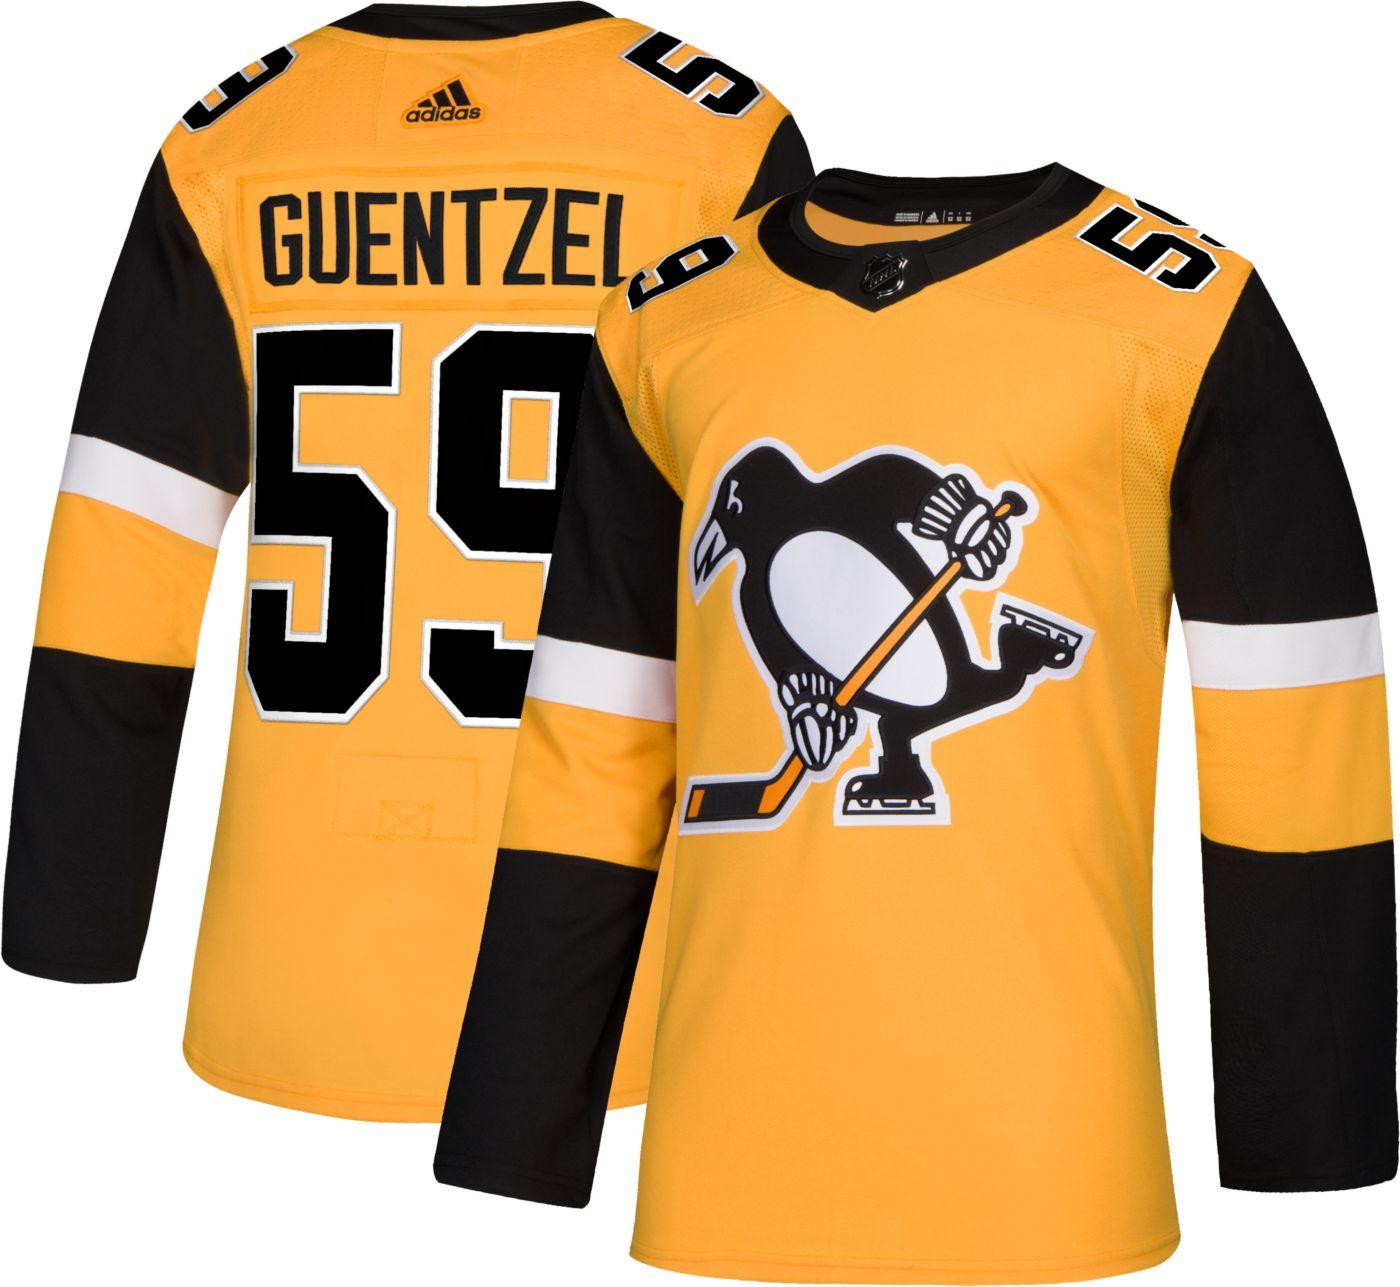 adidas Men's Pittsburgh Penguins Jake Guentzel #59 Authentic Pro Alternate Jersey